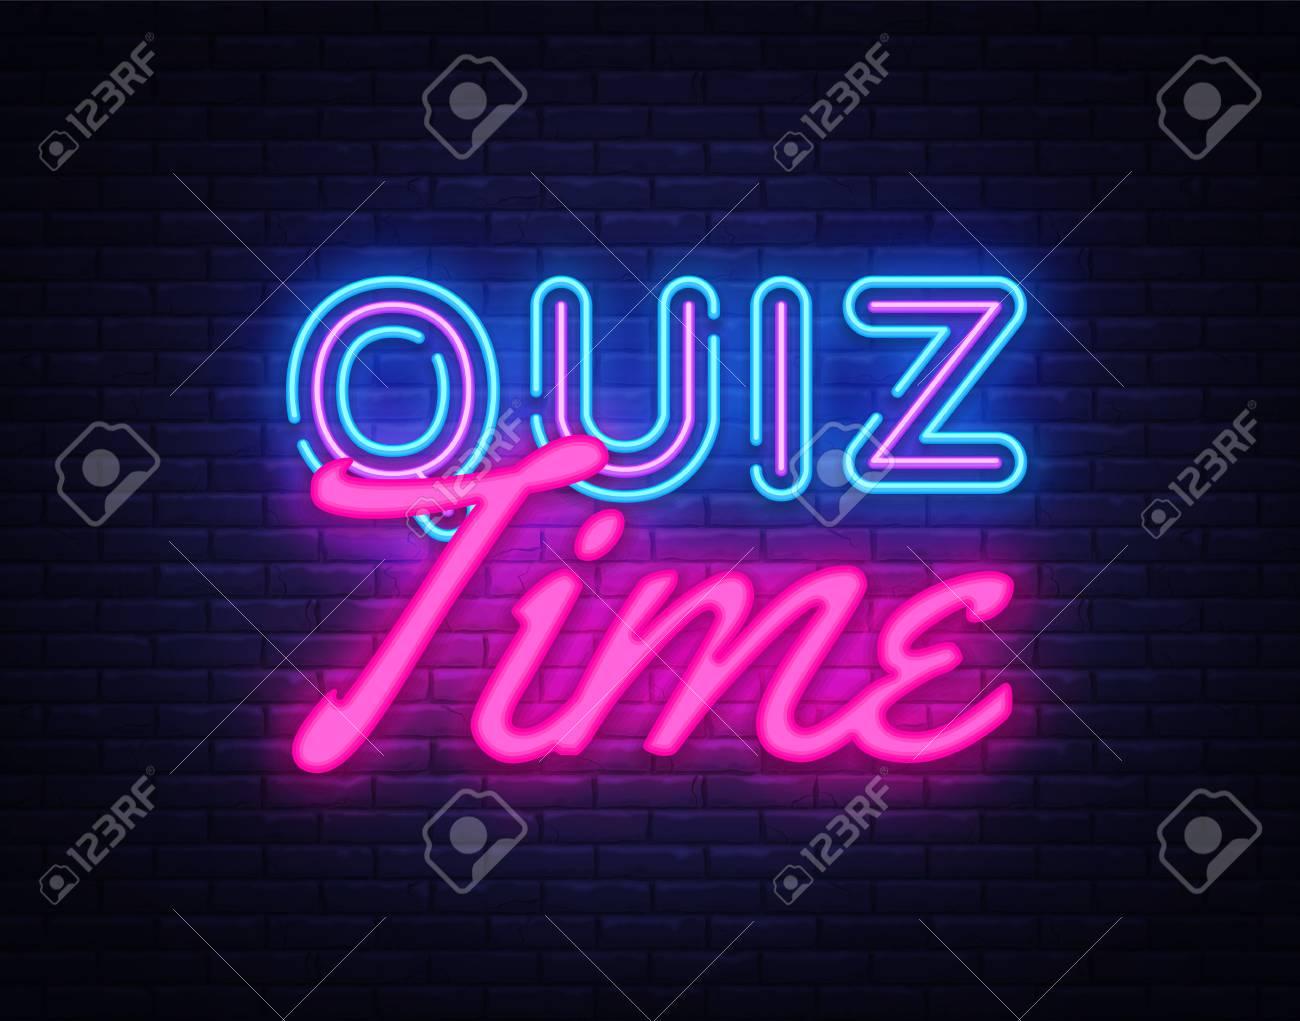 Quiz Time neon sign vector. Quiz Pub Design template neon sign, light banner, neon signboard, nightly bright advertising, light inscription. Vector illustration. - 110272407